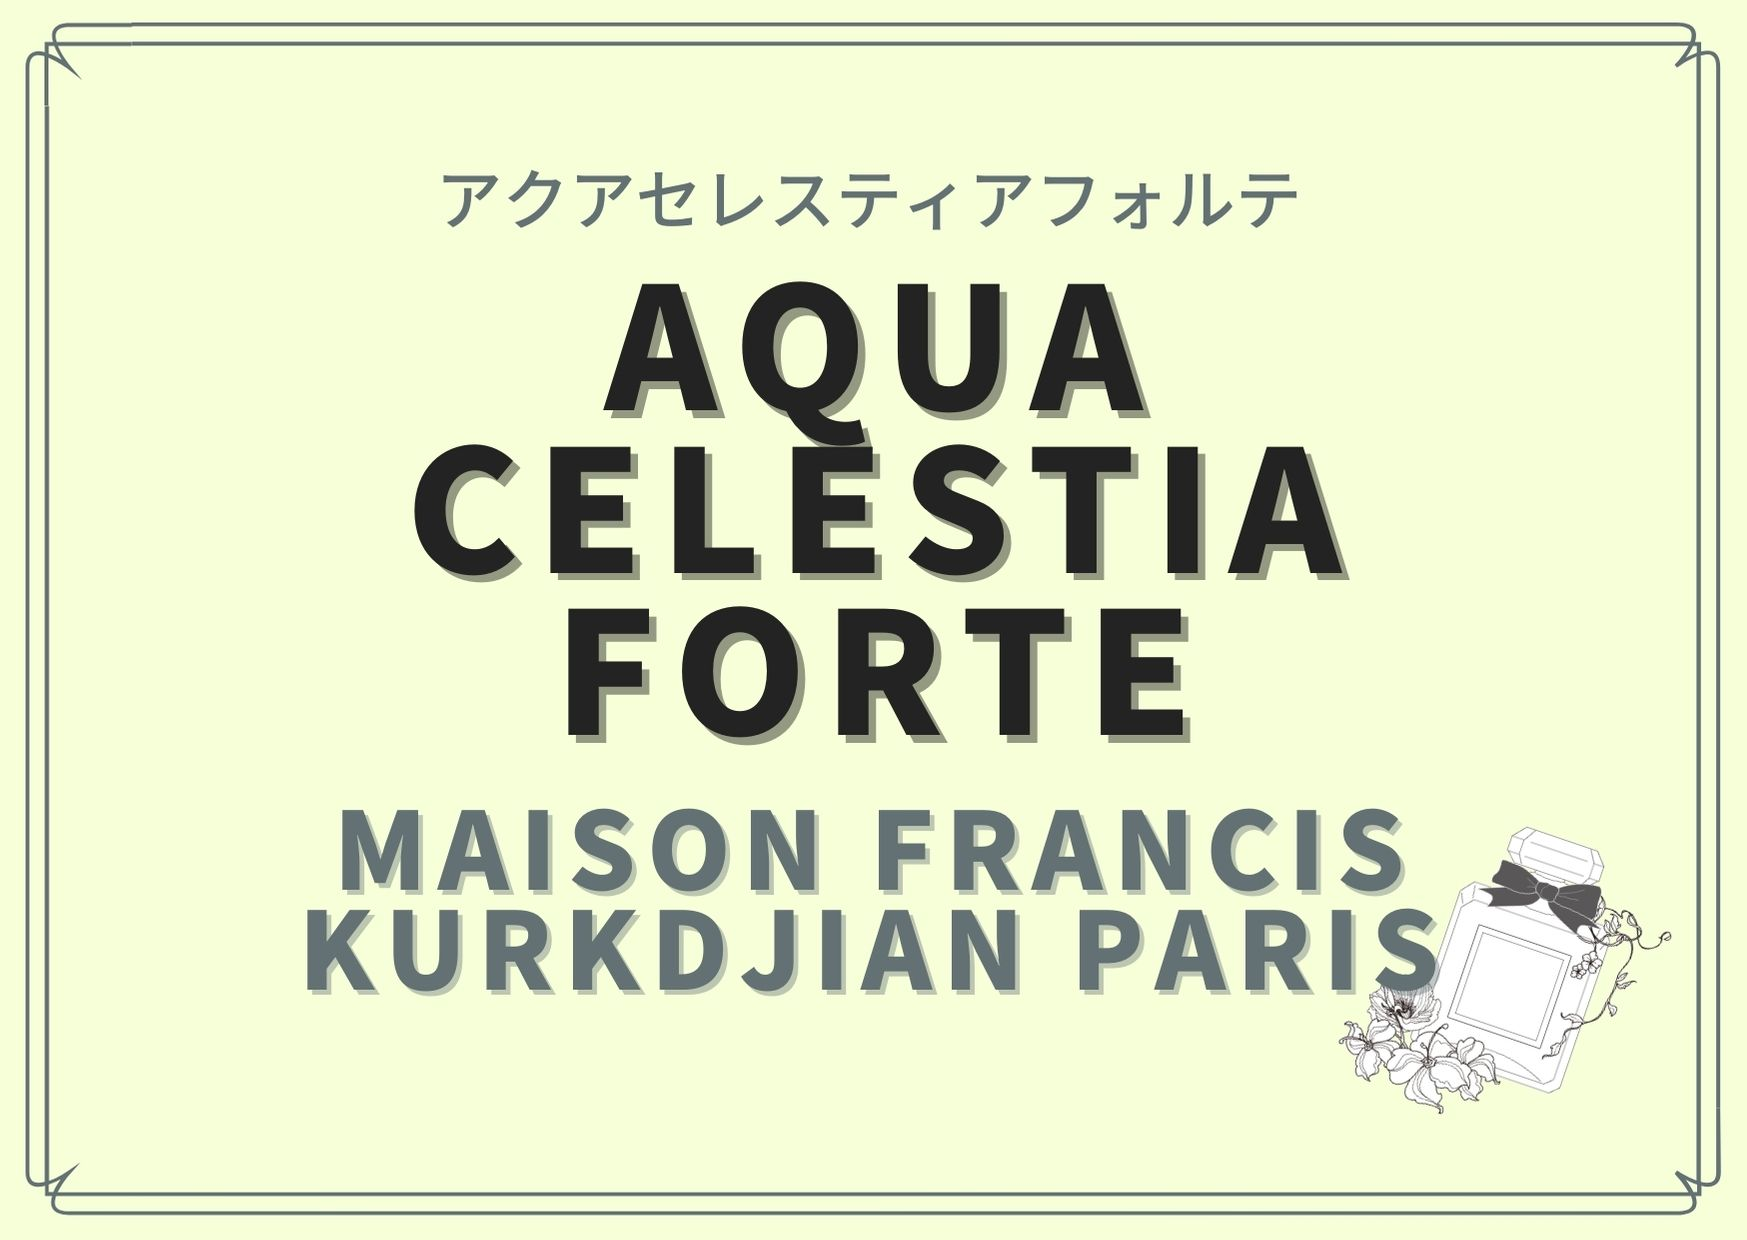 AQUA CELESTIA FORTE (アクアセレスティアフォルテ) / Maison Francis Kurkdjian Paris(メゾン フランシス クルジャン)